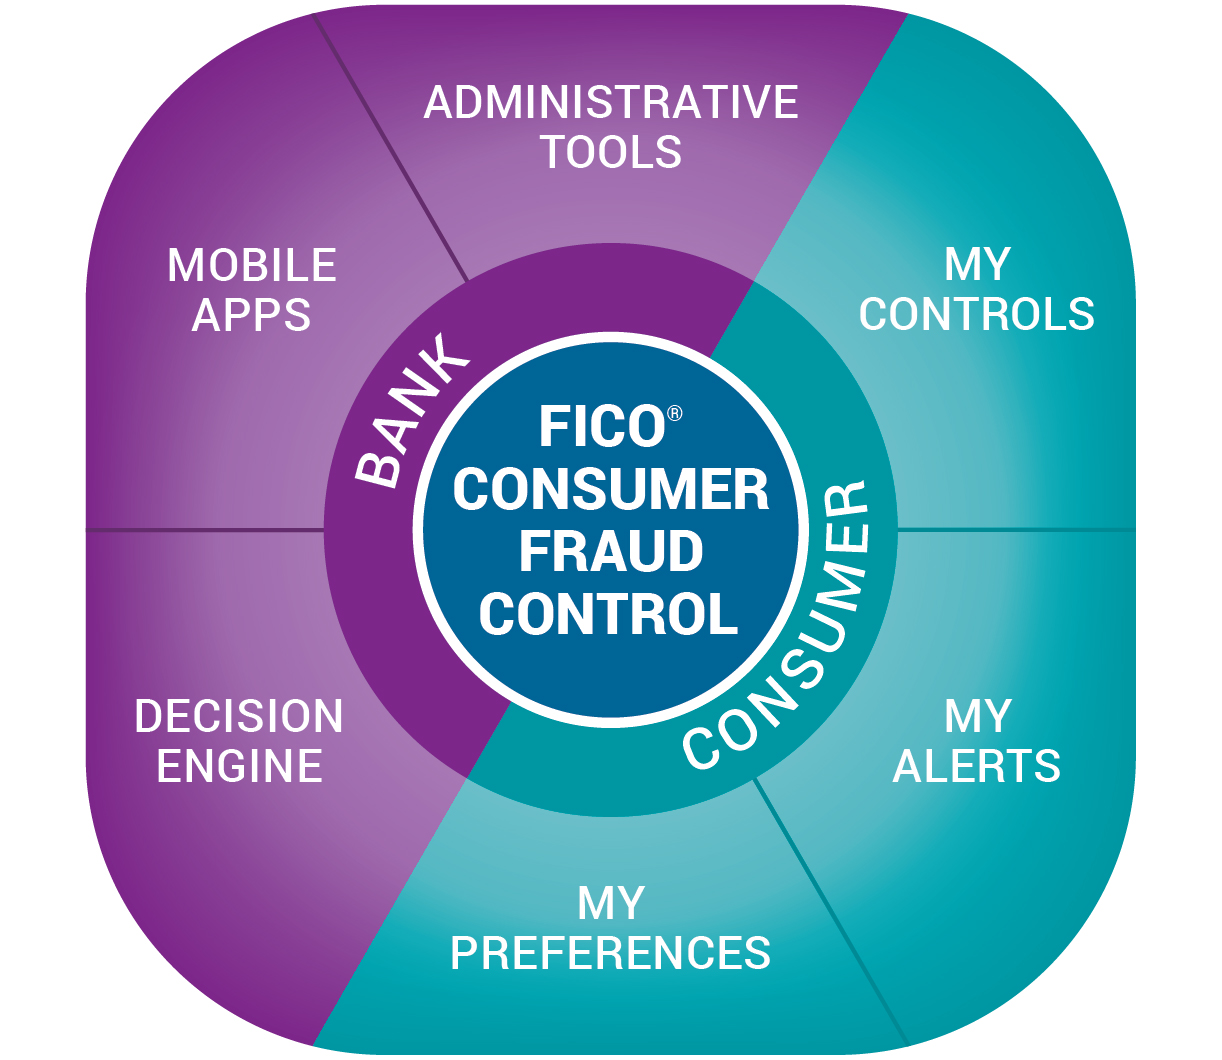 FICO Consumer Fraud Control